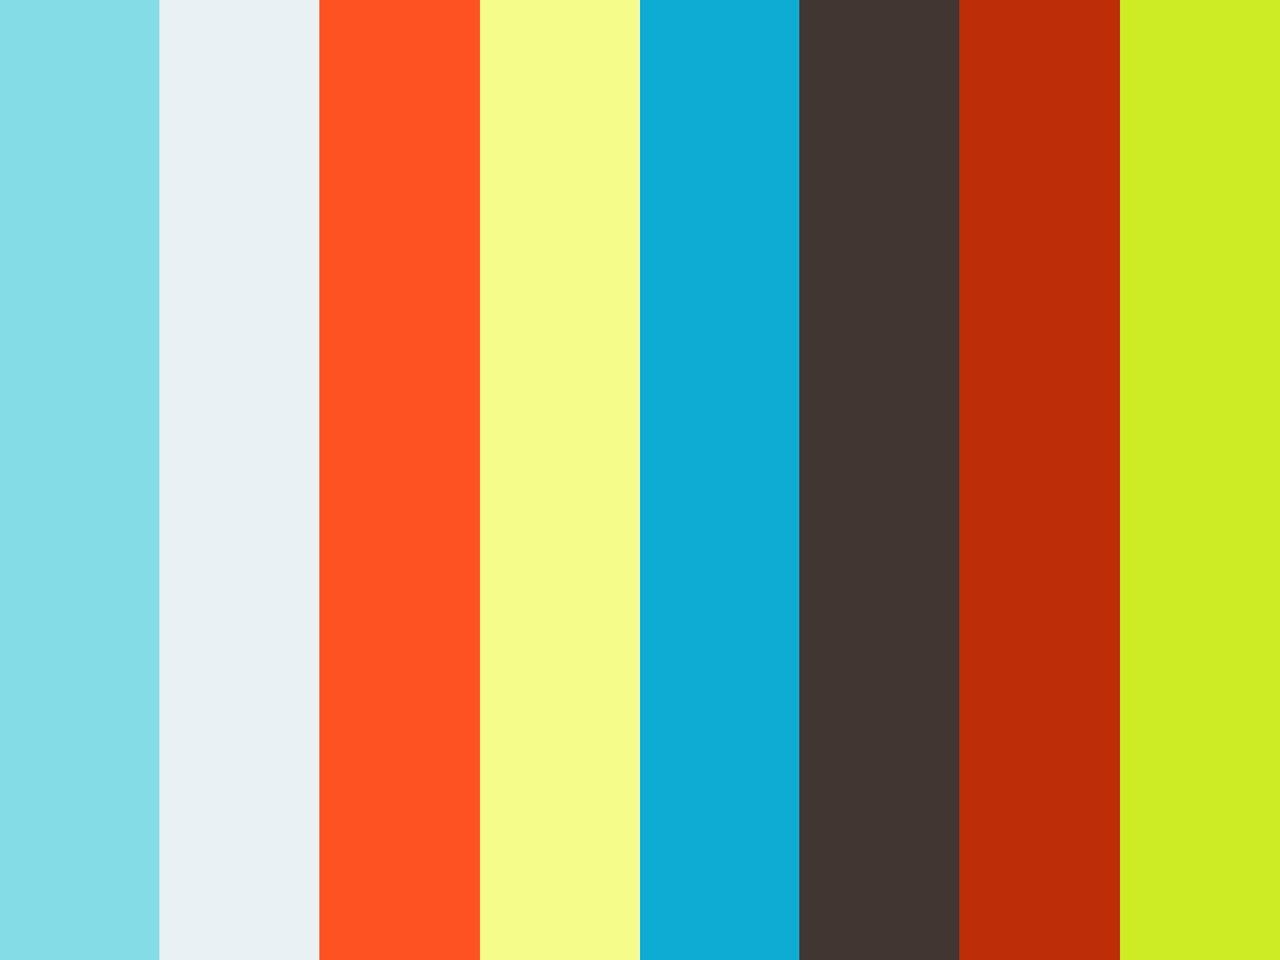 Thibaut Petillon - Color Grading showreel 2015 - Happy Grading